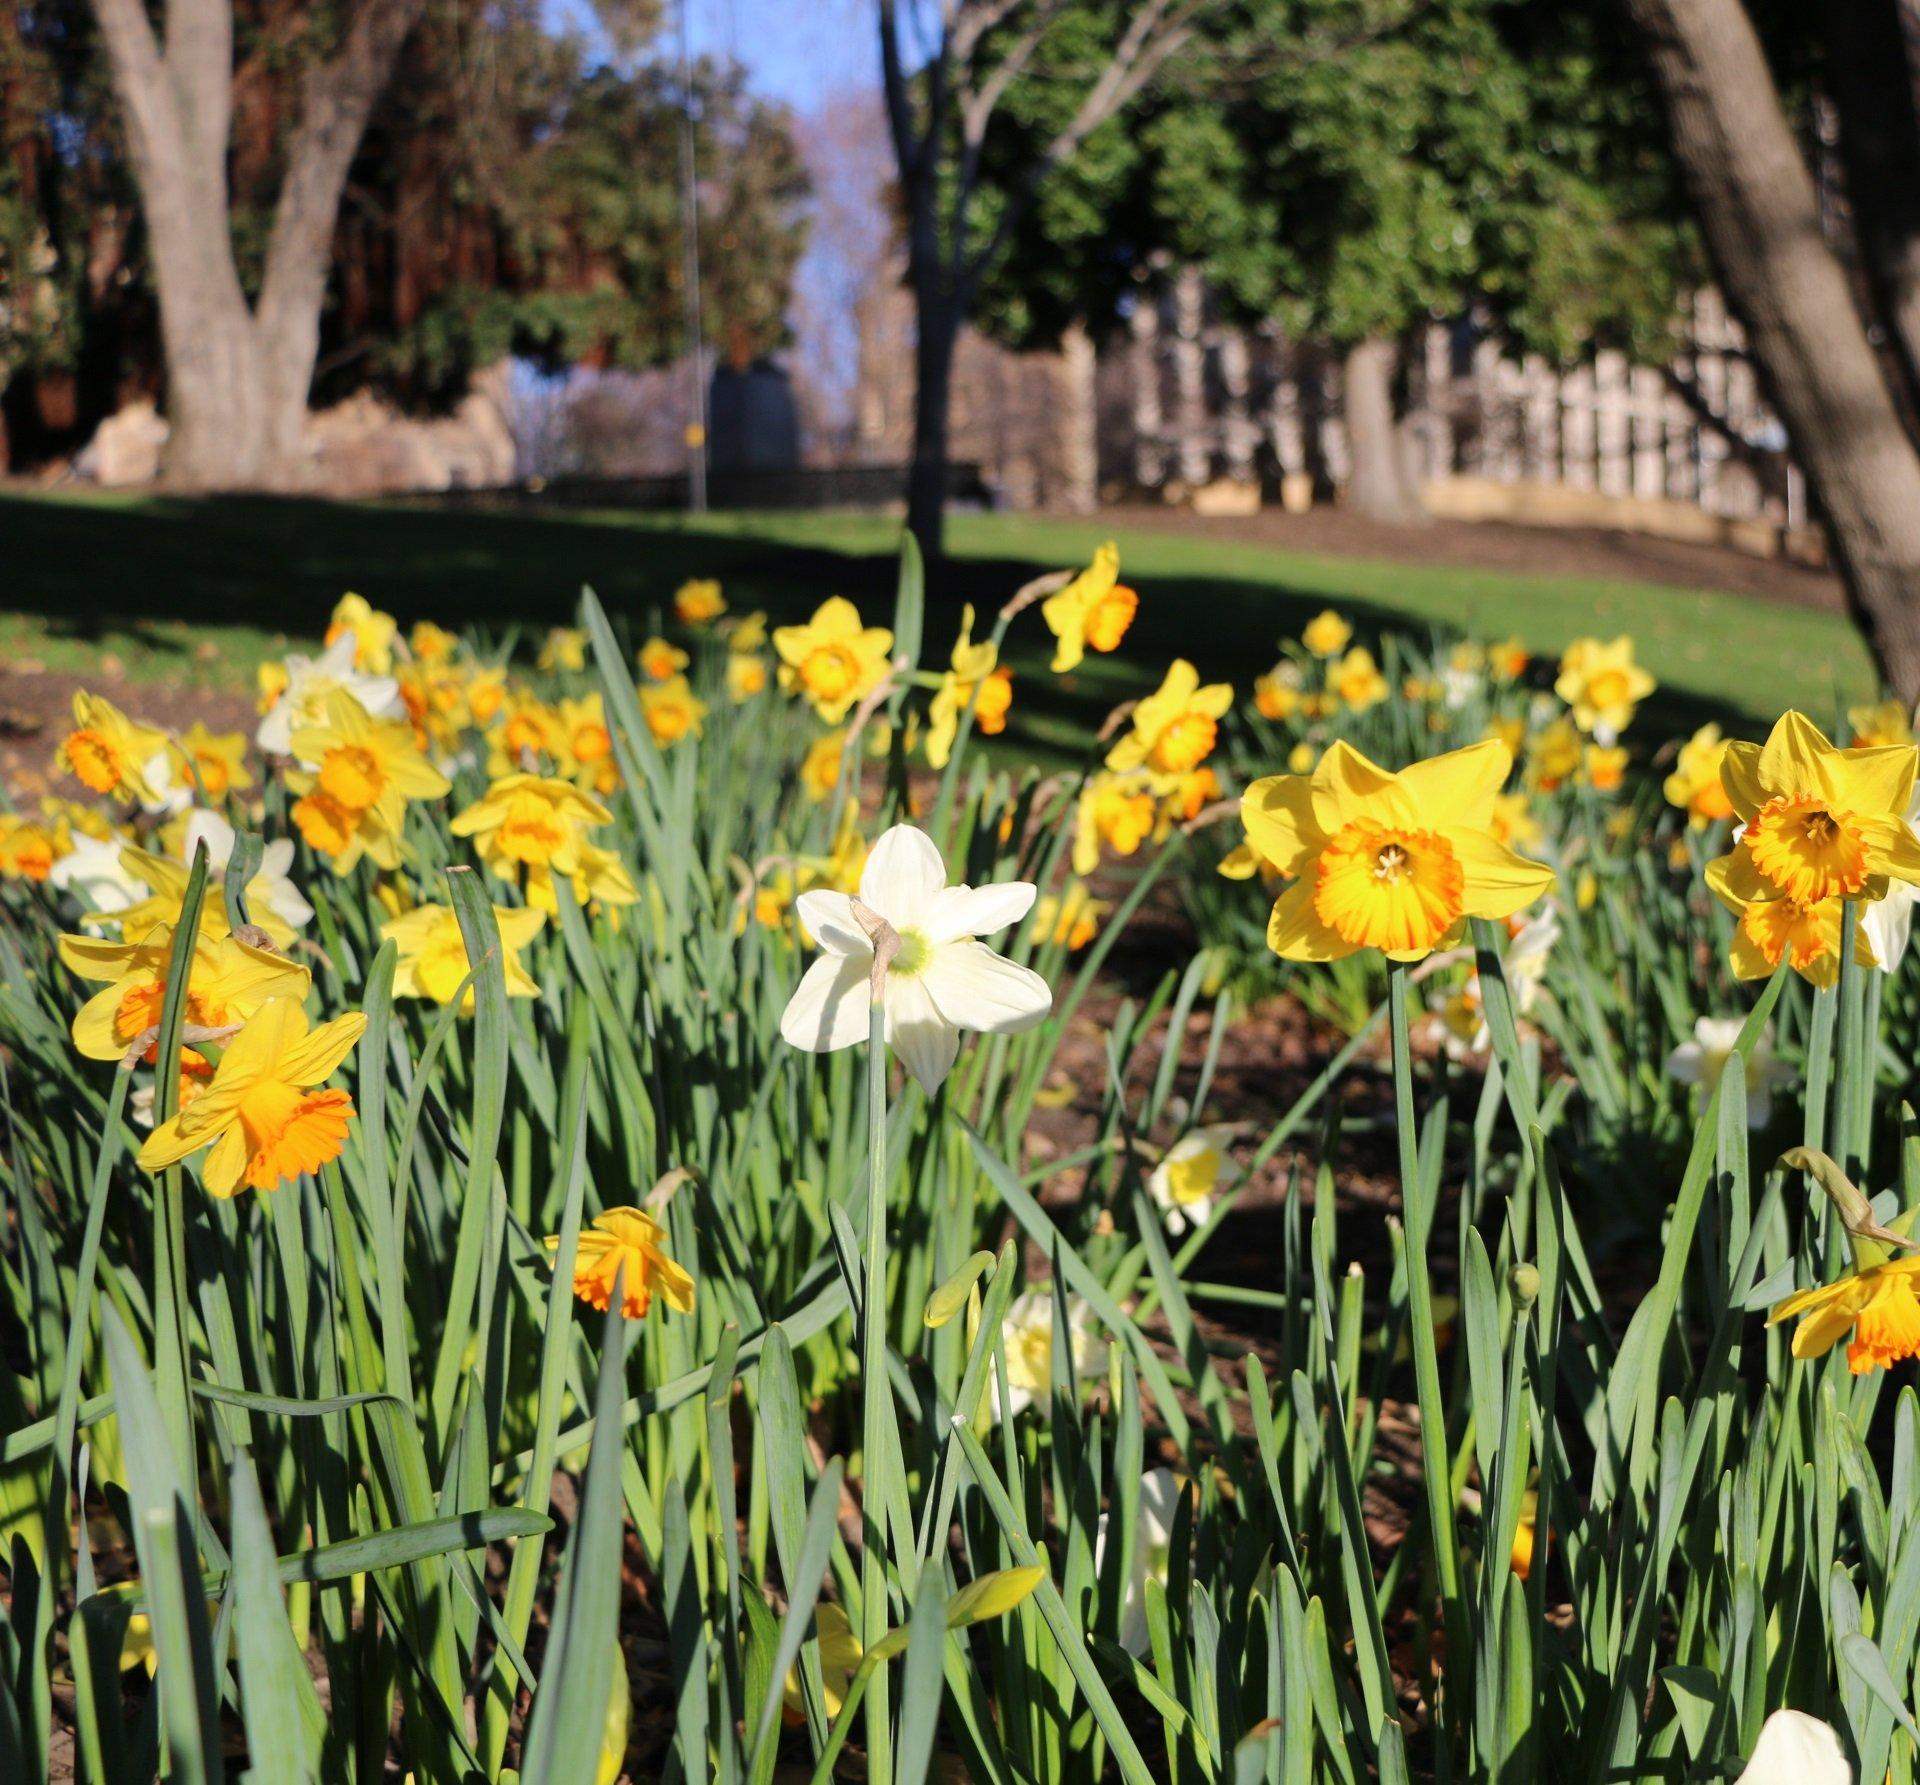 Spring-background-image-2